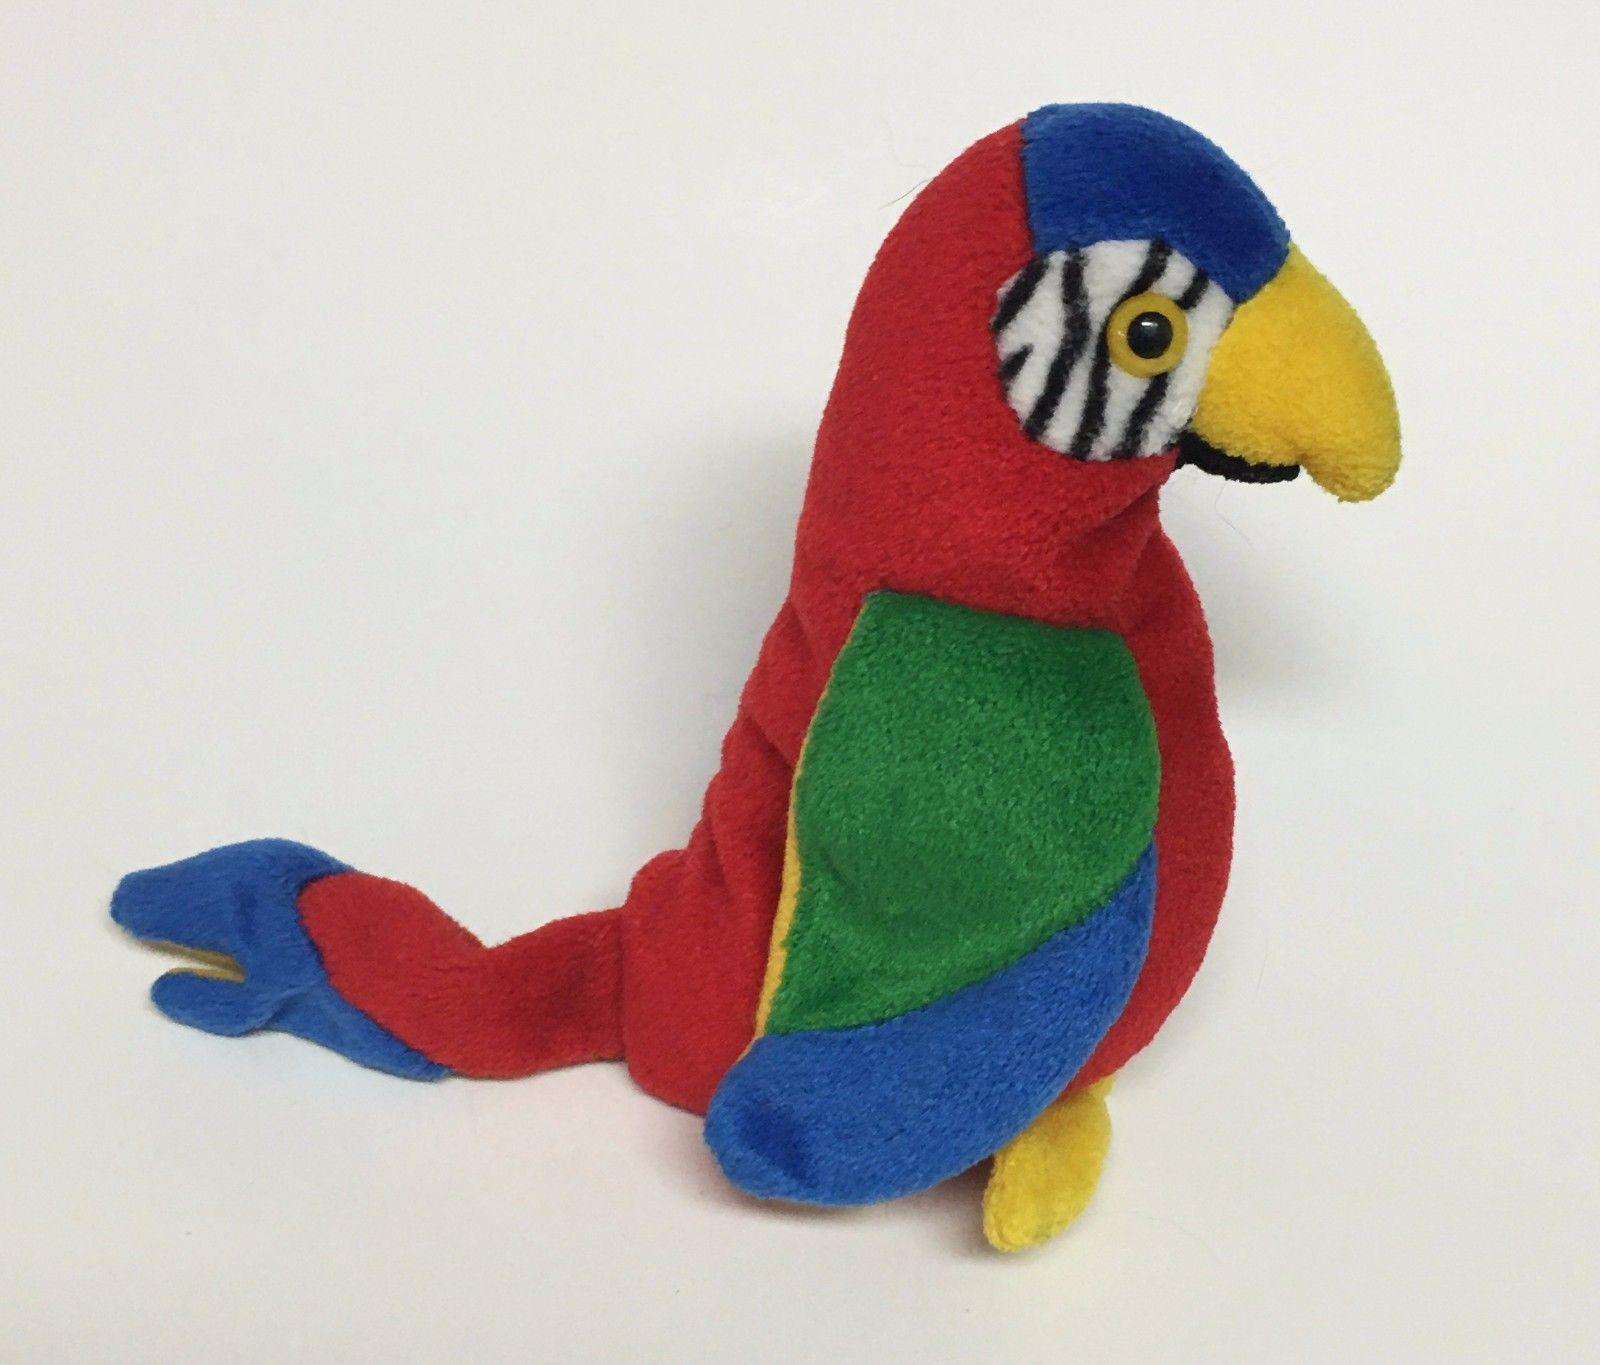 86b07c87ef3 Ty Beanie Babies Jabber parrot Stuffed Plush and 50 similar items. S l1600